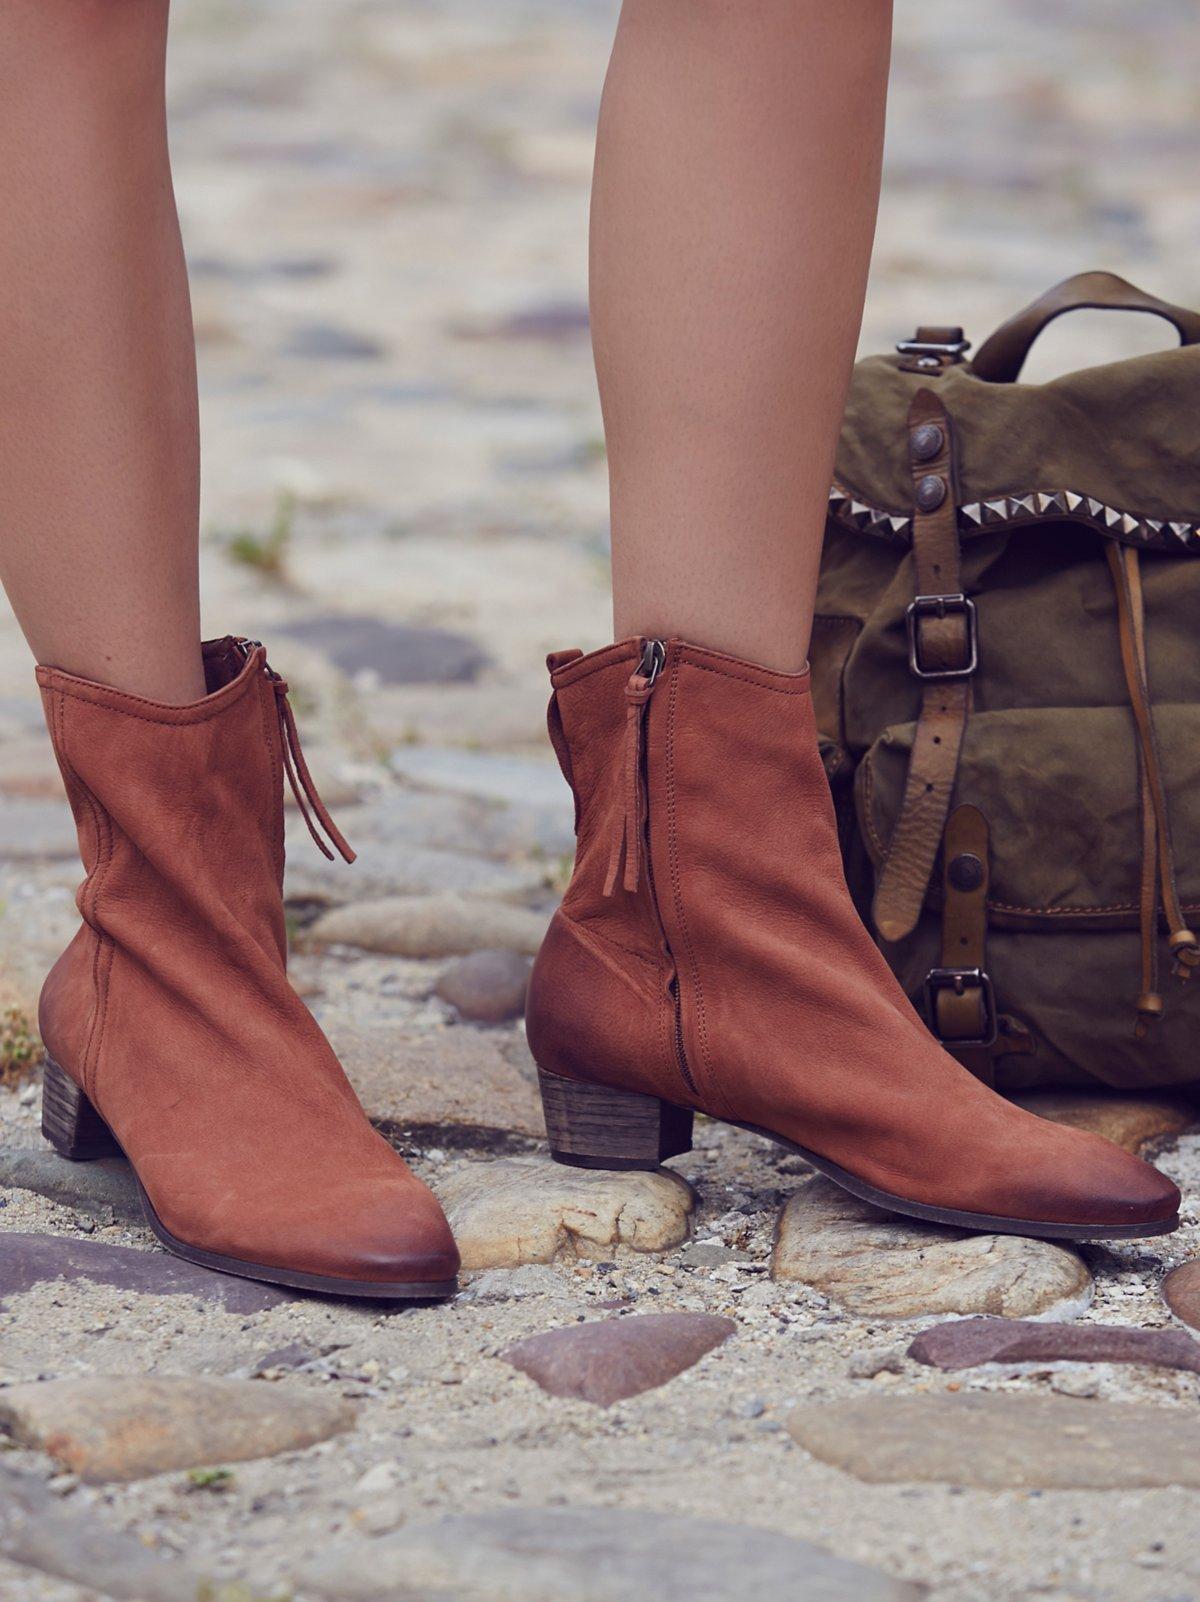 London Calling踝靴